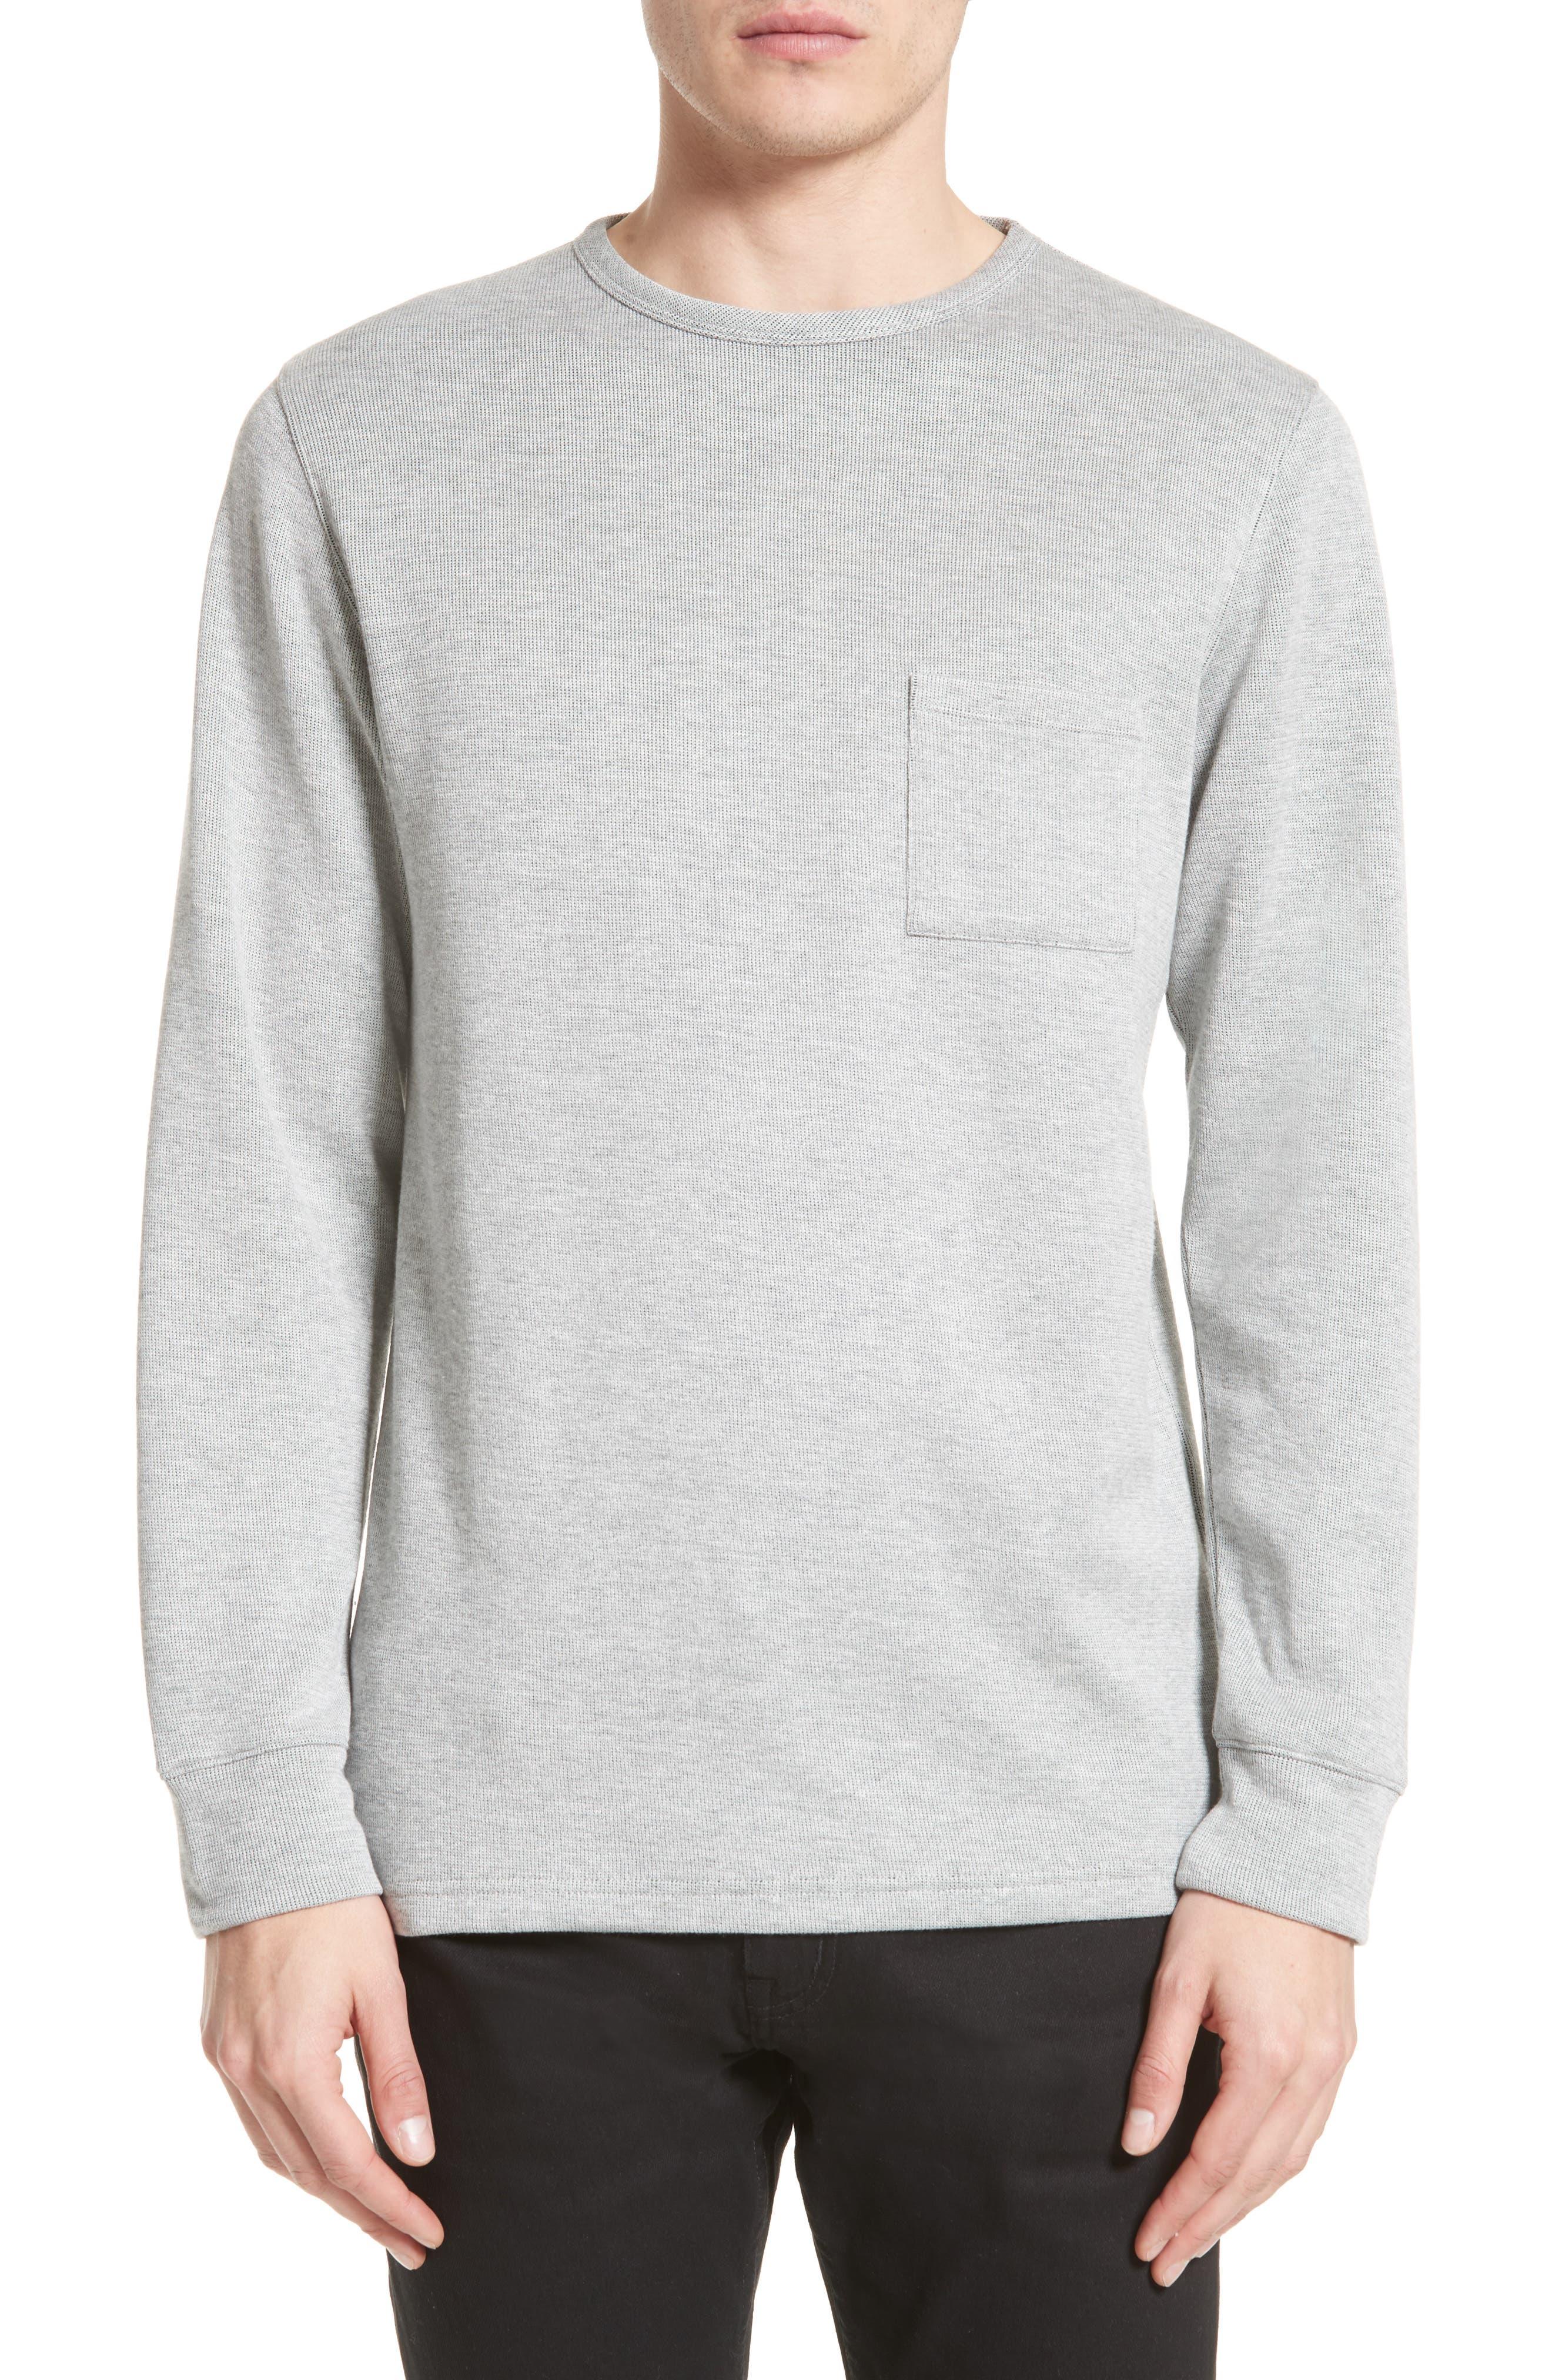 Main Image - Saturdays NYC James Pocket Sweater